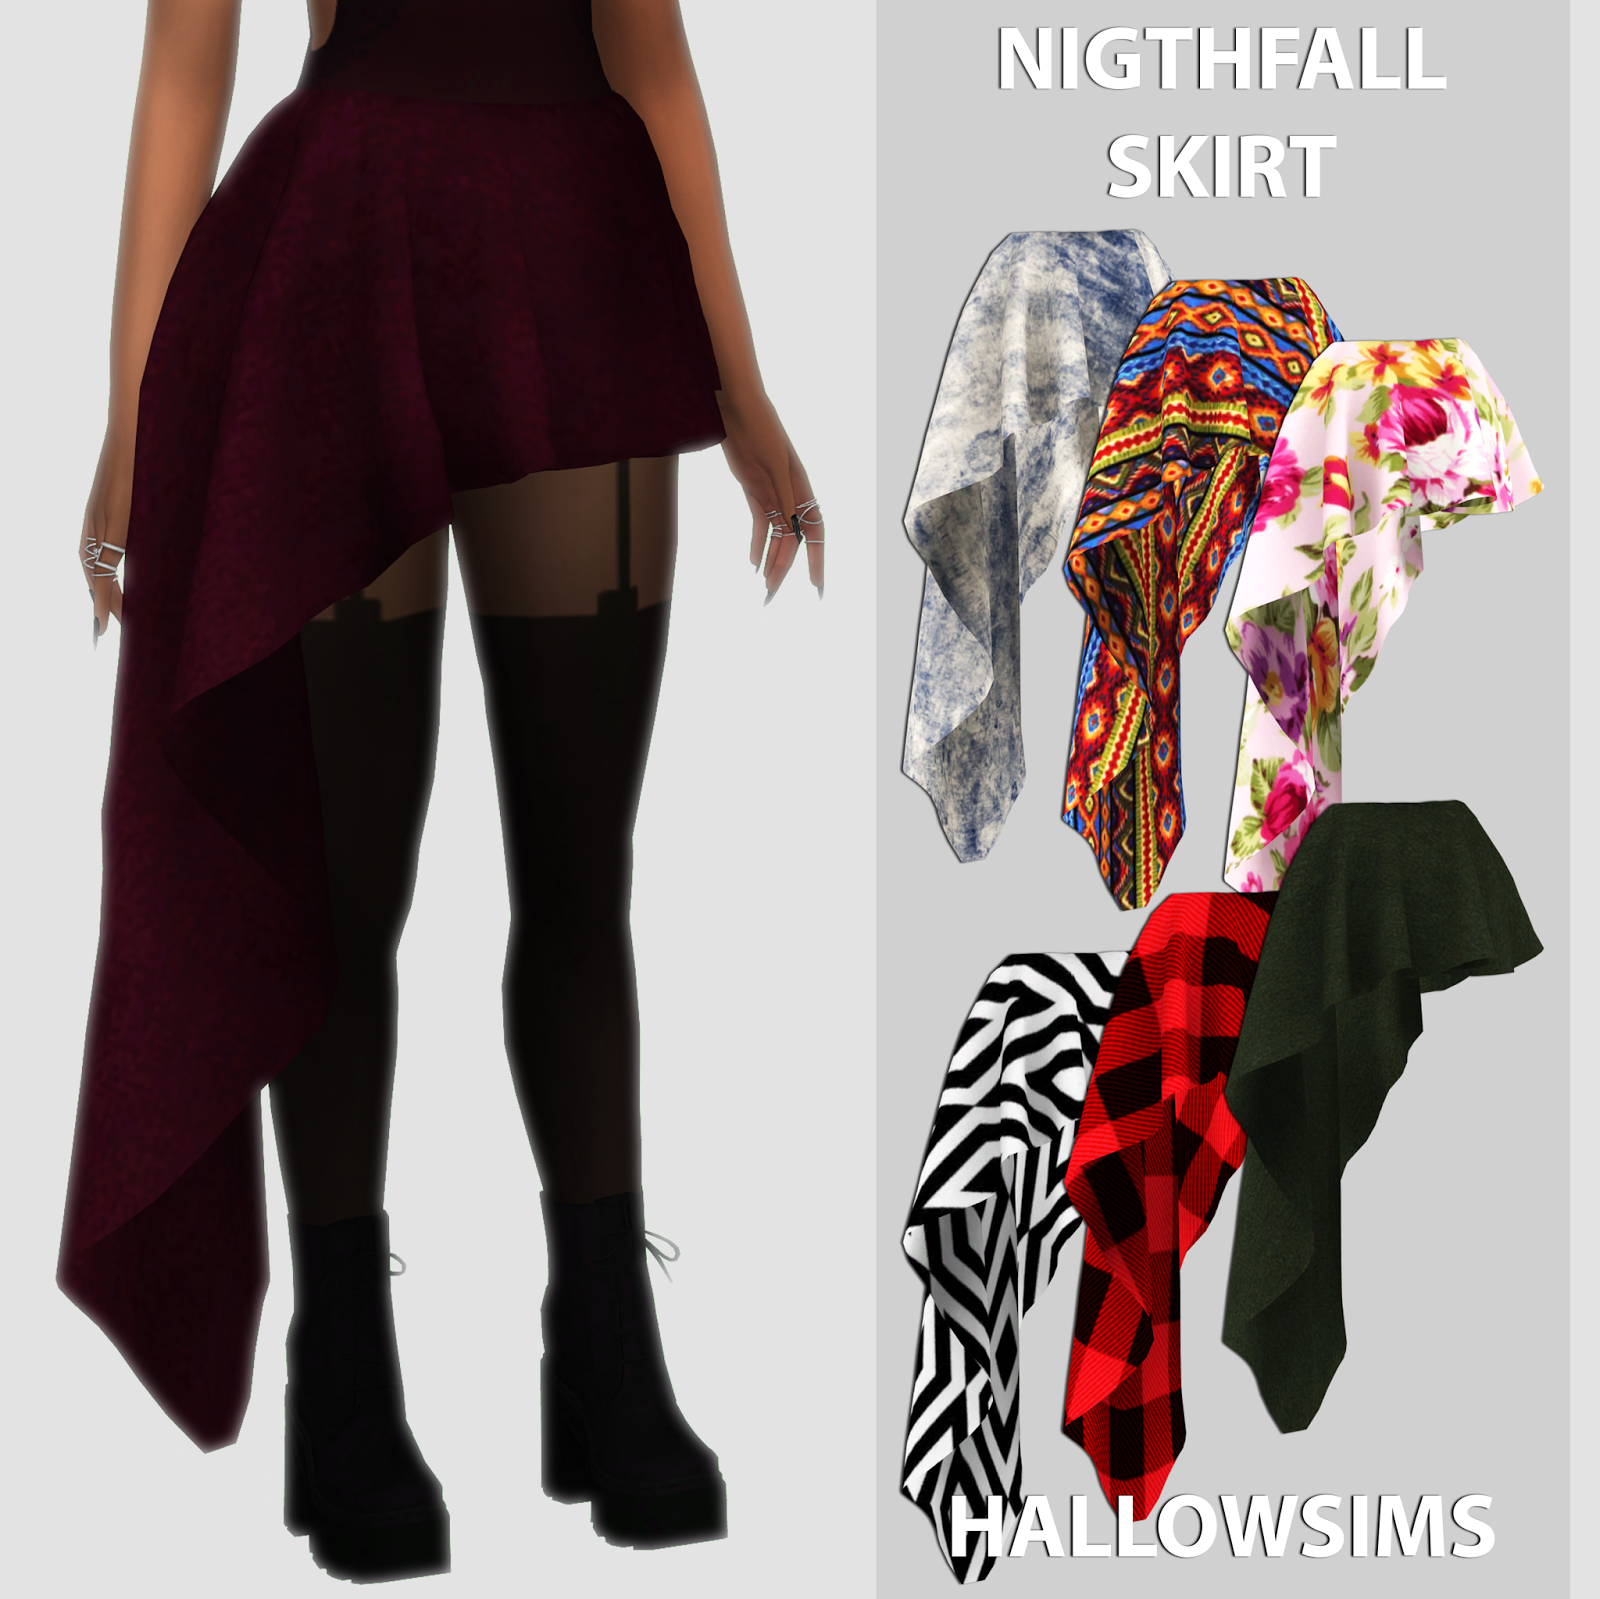 Nightfall Skirt HallowSims Sims 4 dresses, Sims 4 cc